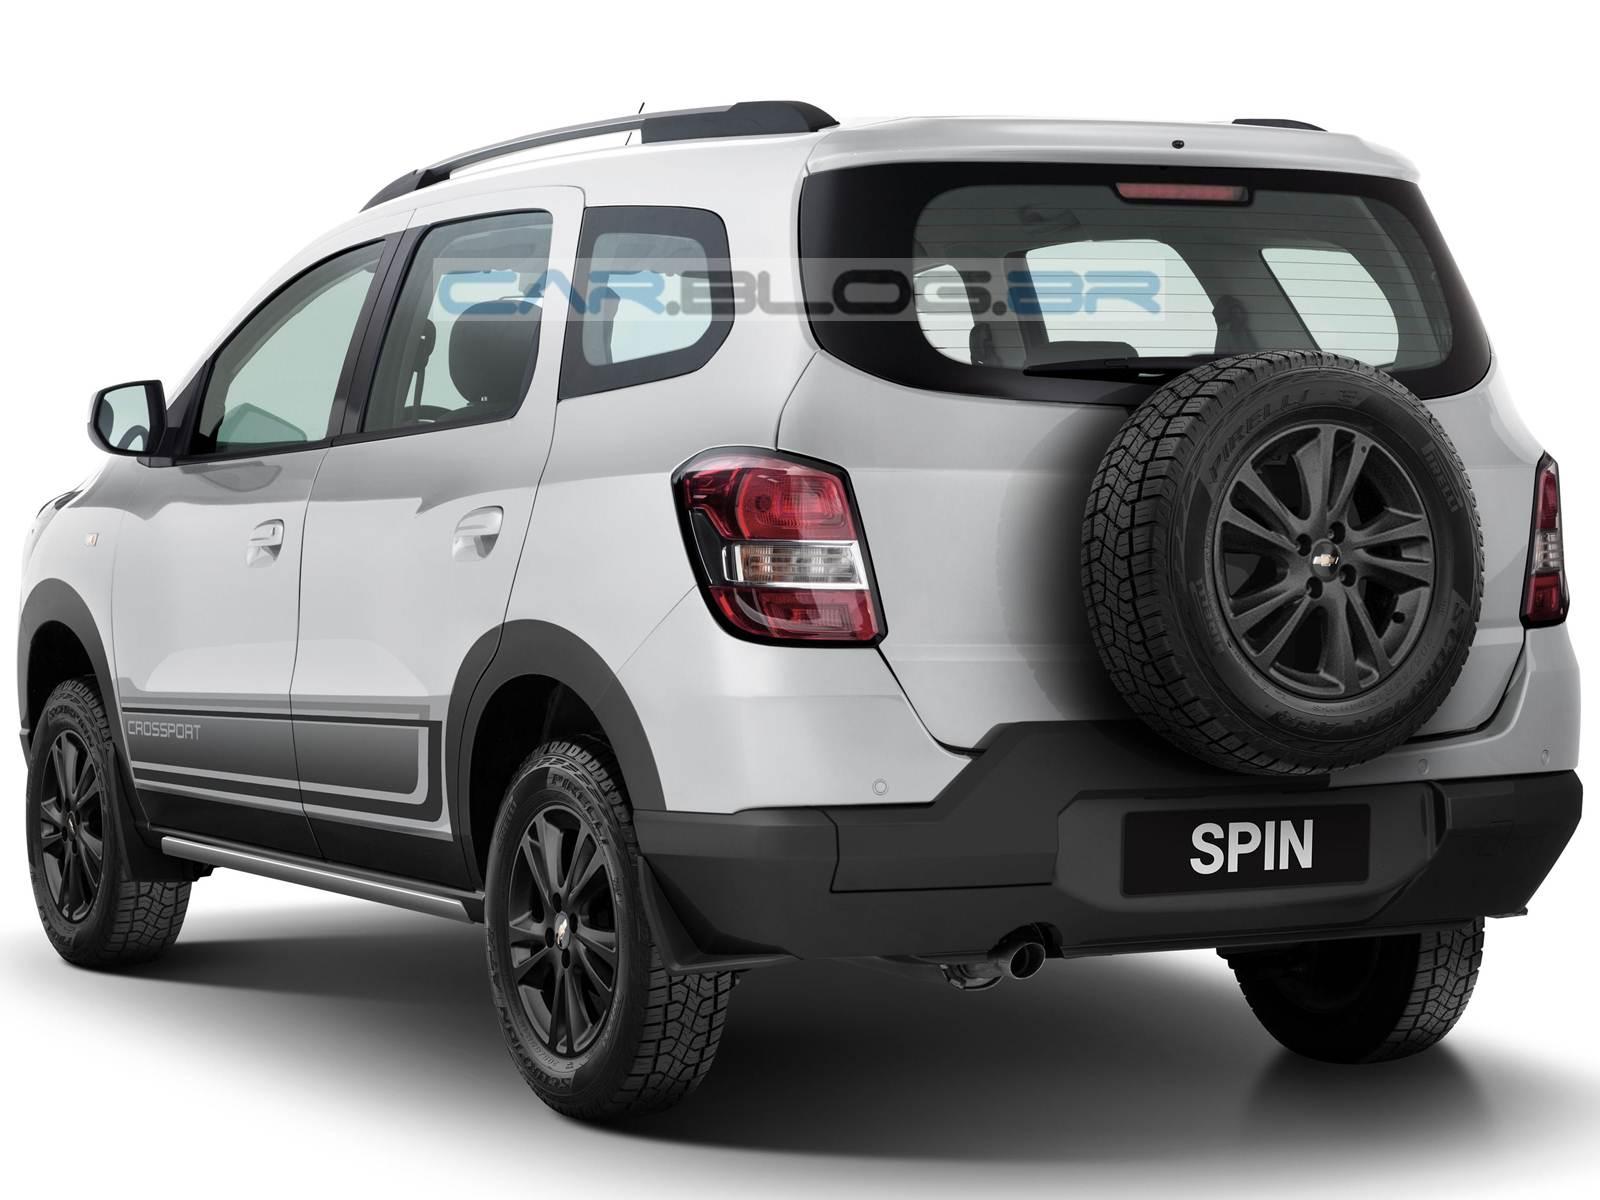 Chevrolet Spin SR